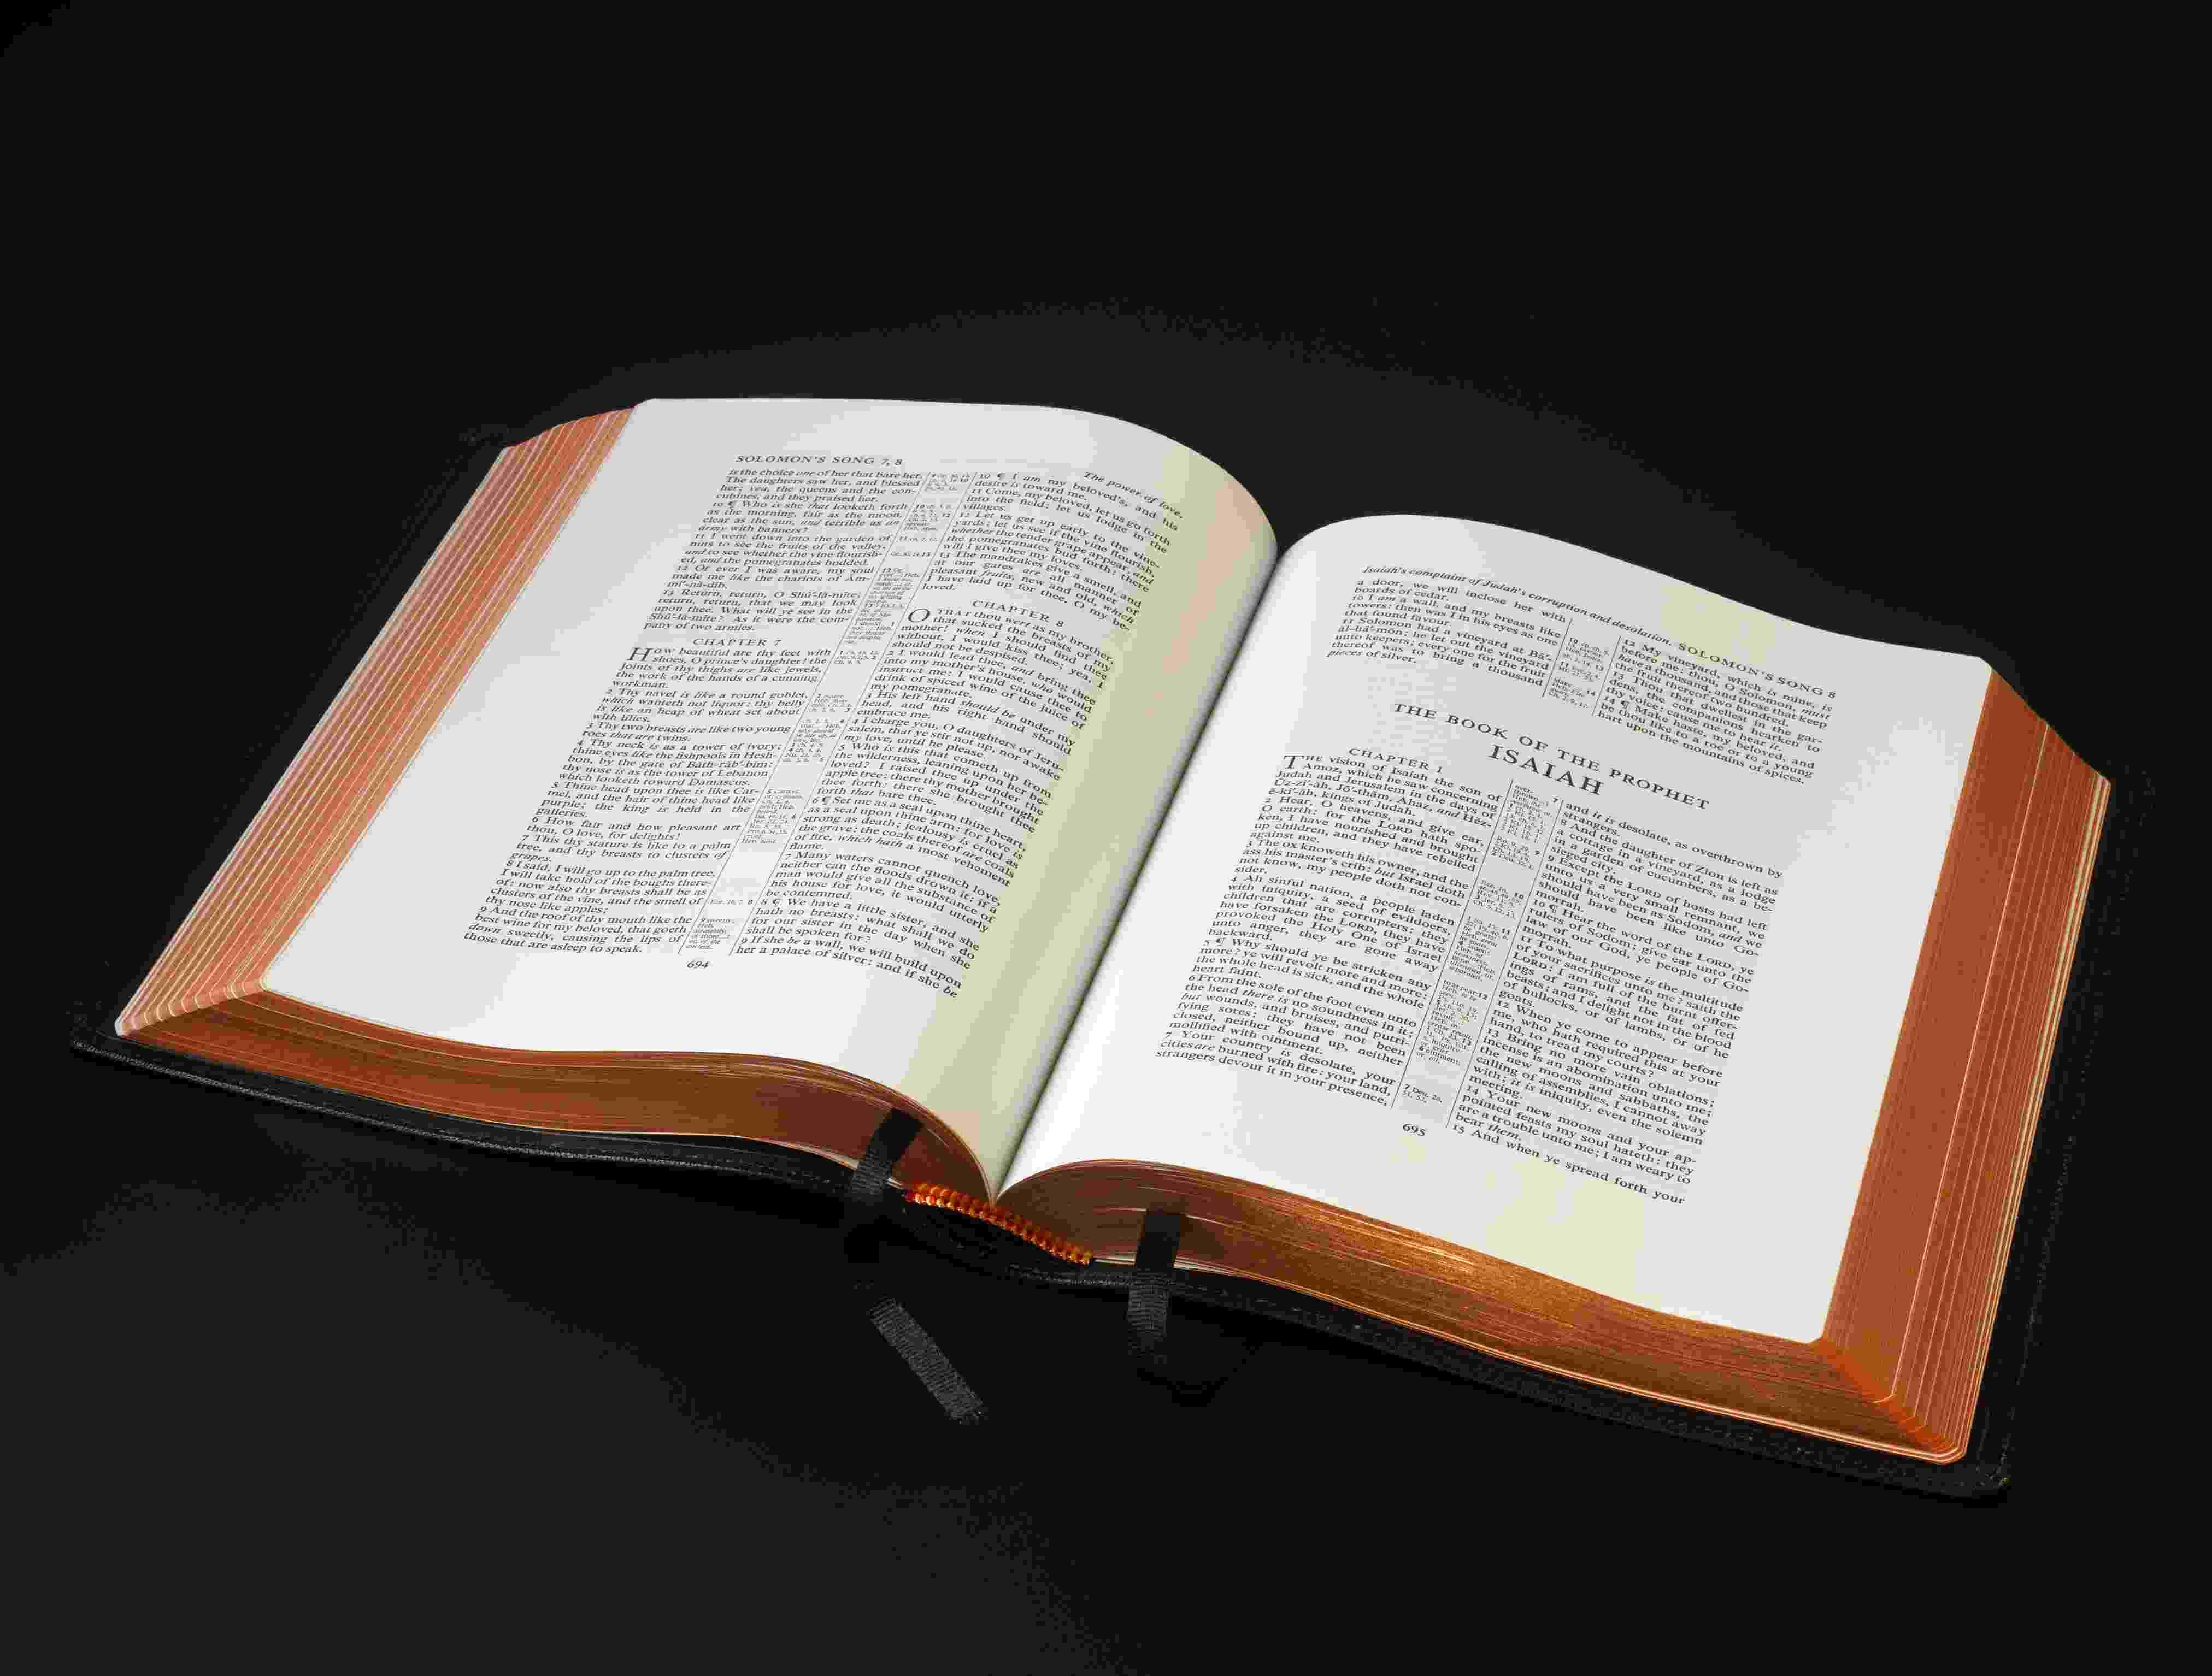 Colour book edges - C0229b920c8abf35e2503775a33762f1_f881278 D26713296de2fcd889250856eedd5ed8_f881282 Wide_margins